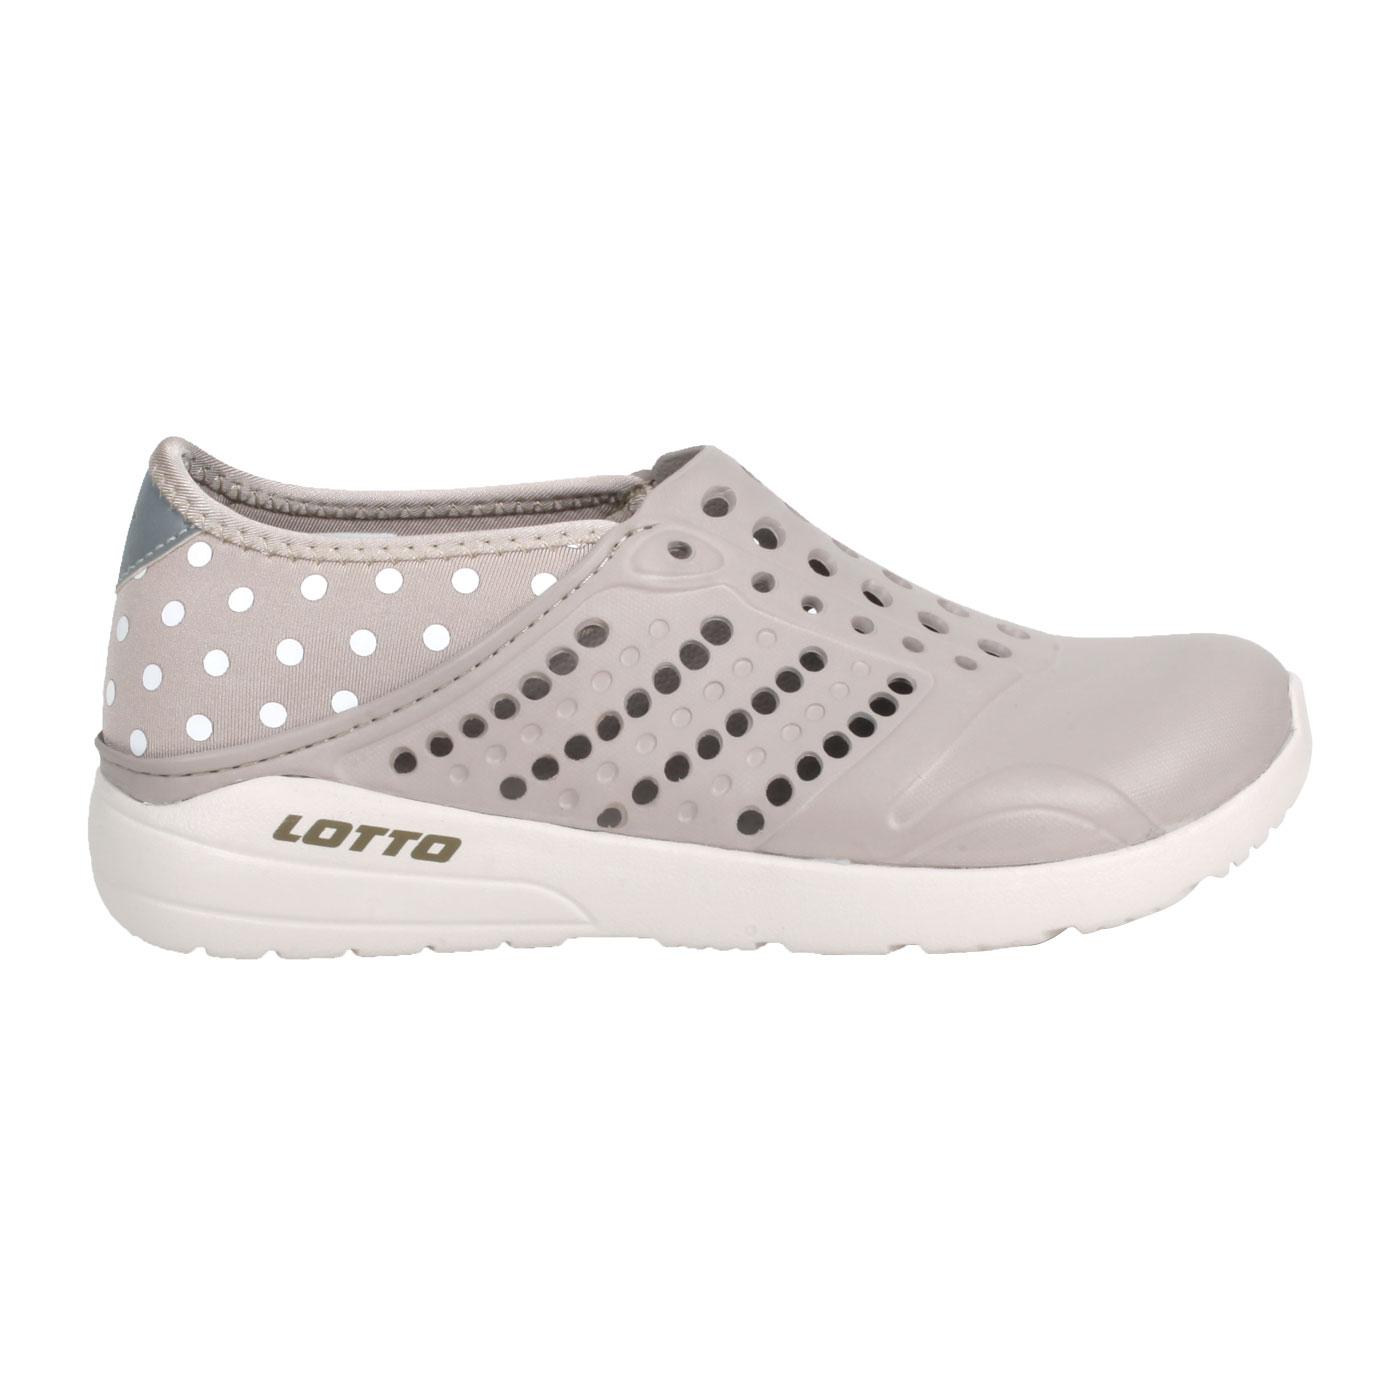 LOTTO 粉點洞洞鞋 LT1AWS3681 - 奶茶白